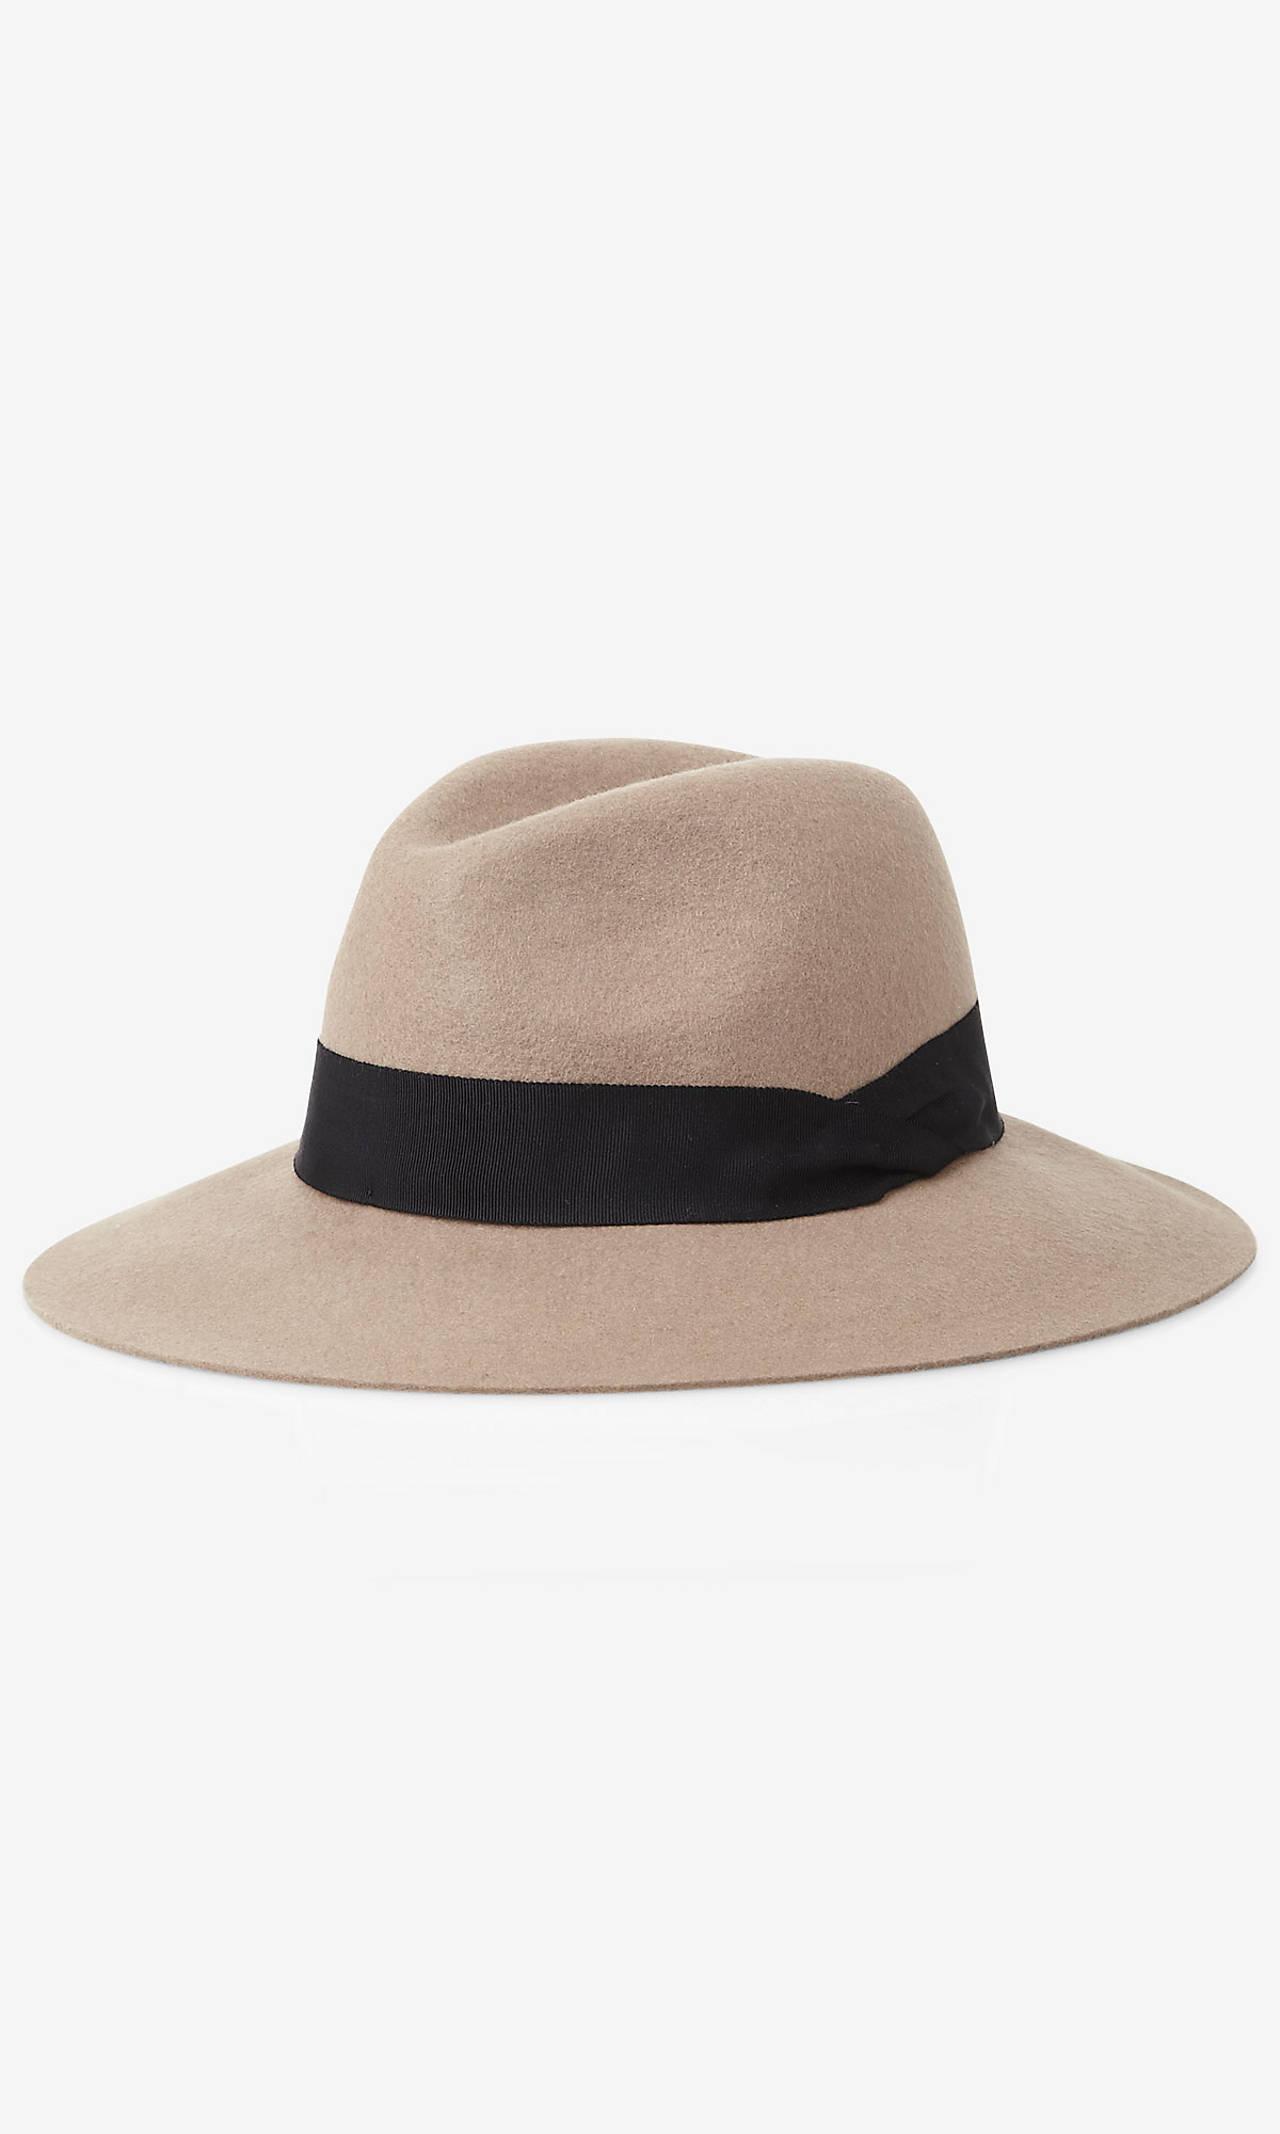 Wool felt fedora hat from express